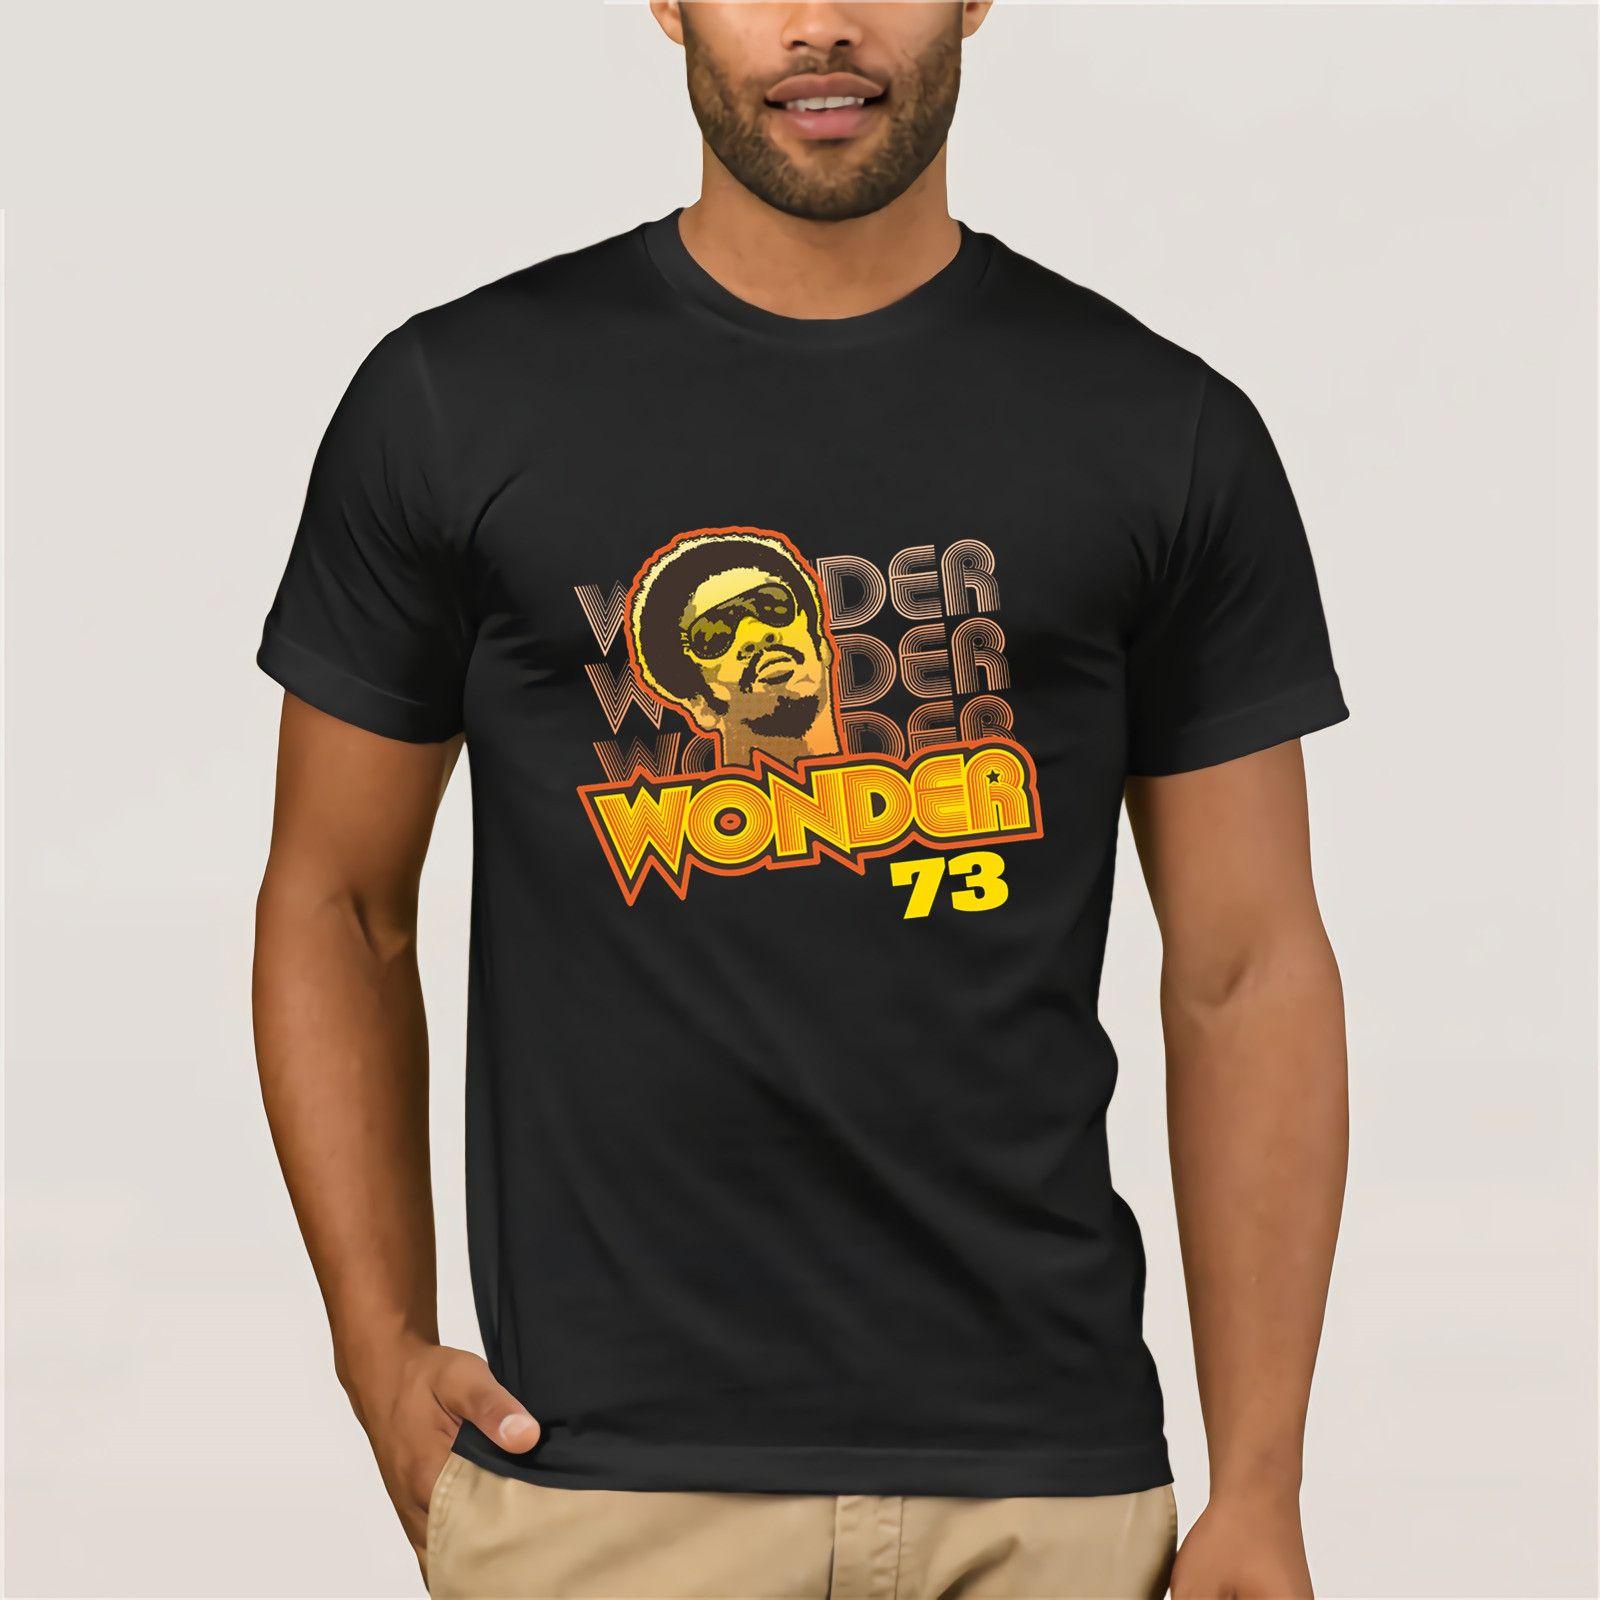 Stevie Wonder 73 T Shirt Best Deal On T Shirts That T Shirt From